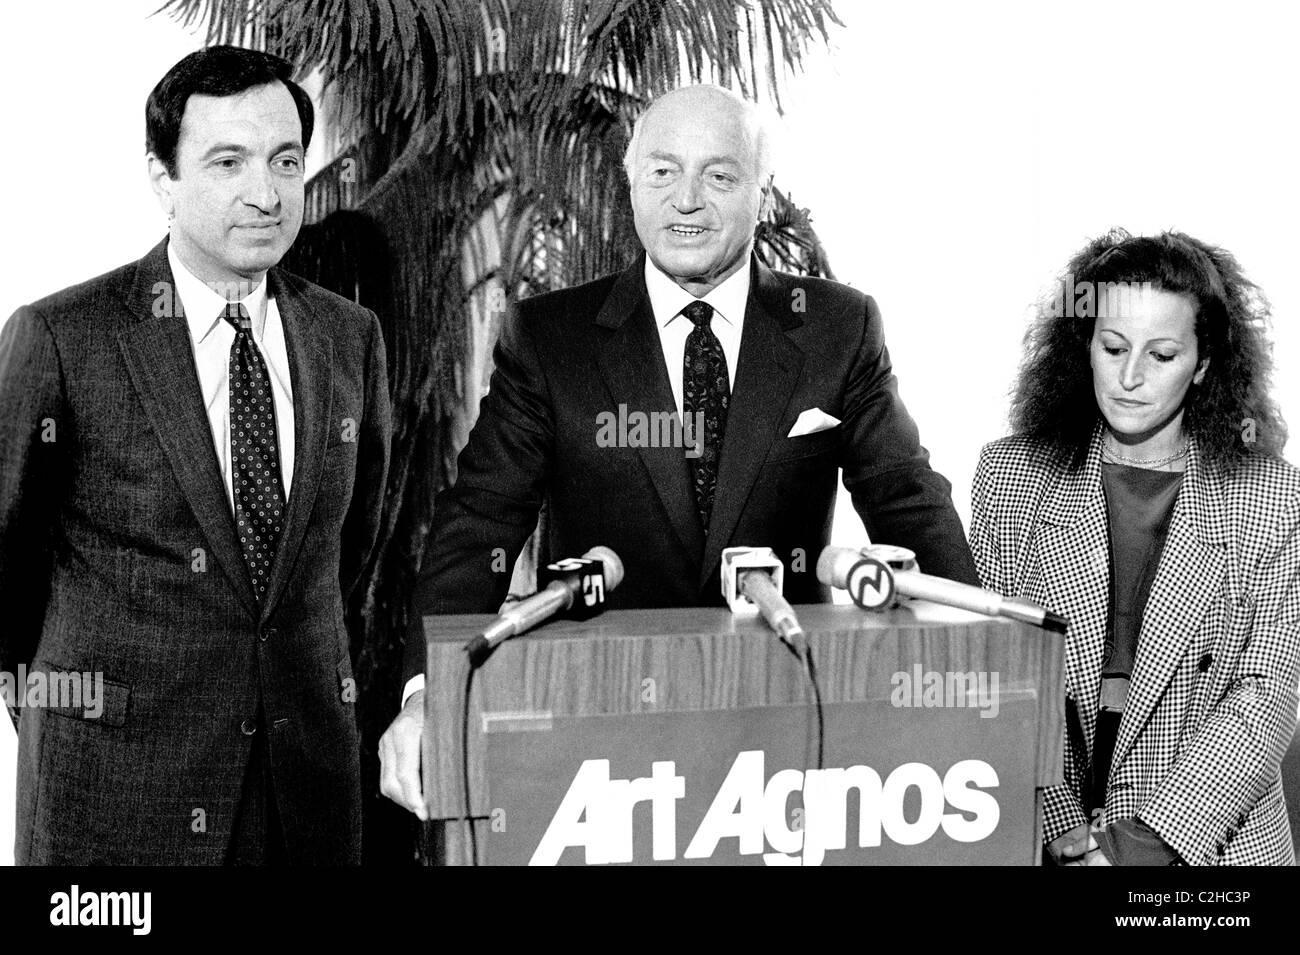 Former San Francisco Mayor Joe Alioto (speaking) & daughter Angela Alioto support Art Agnos for Mayor 1980s - Stock Image